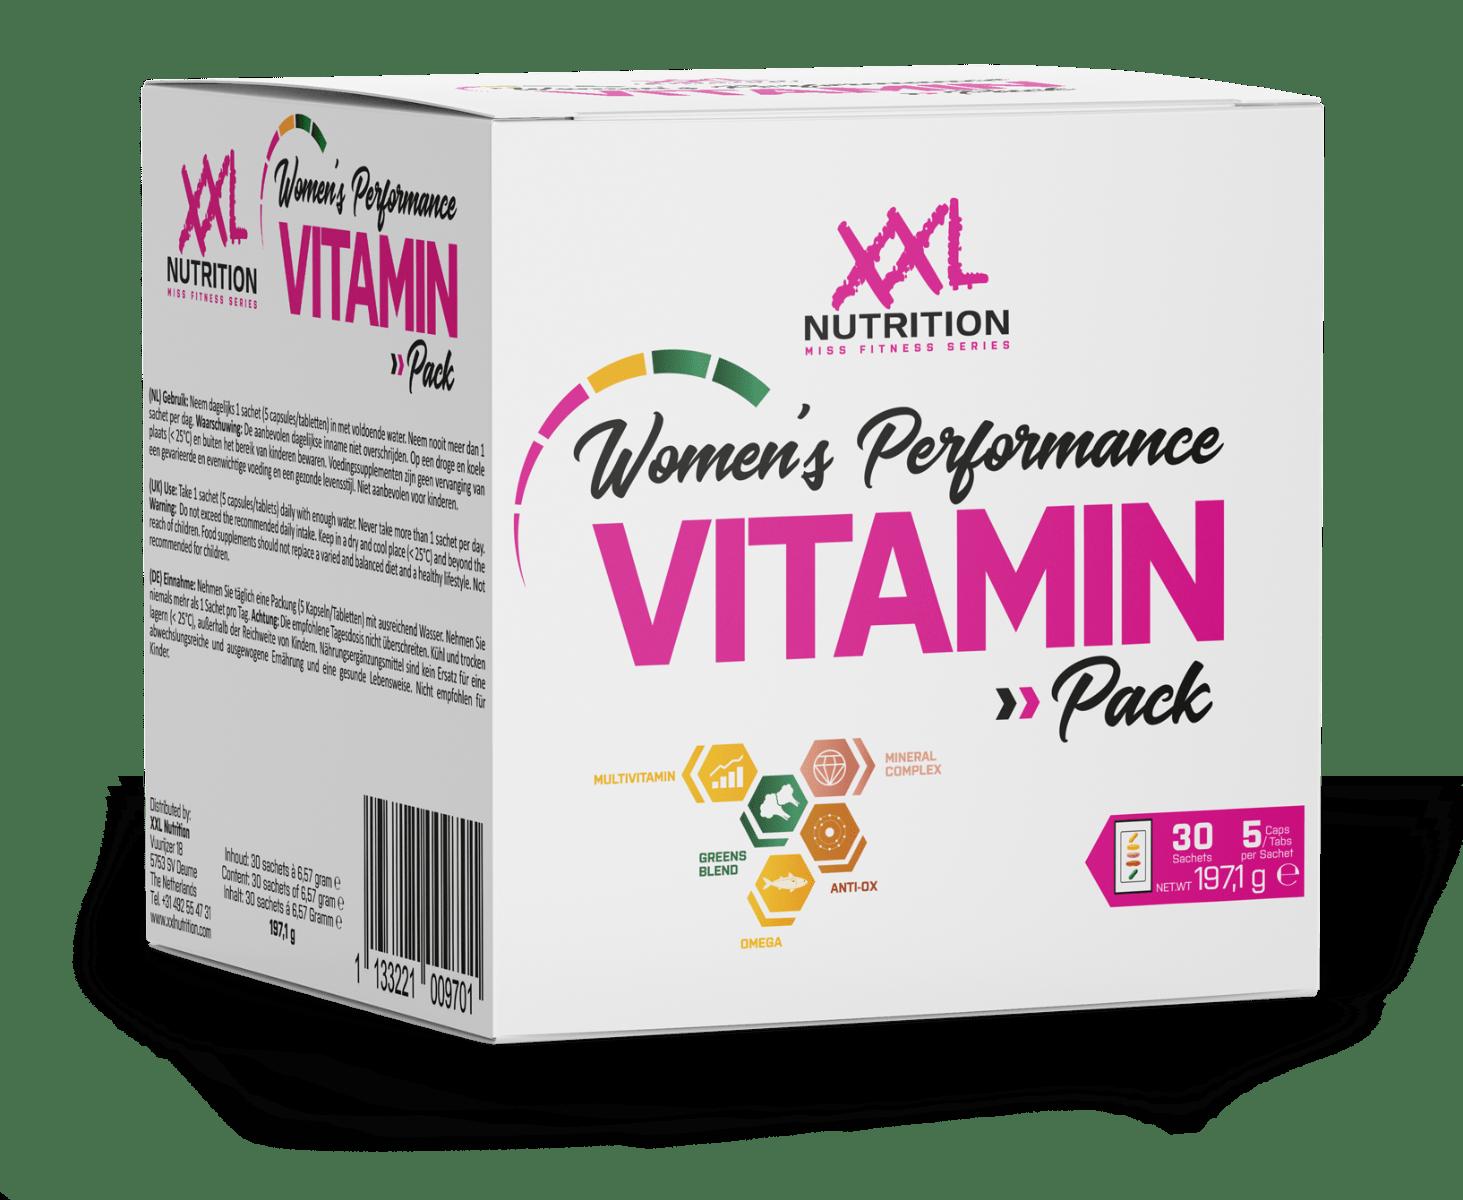 Women's Performance Vitamin Pack - 30 sachets